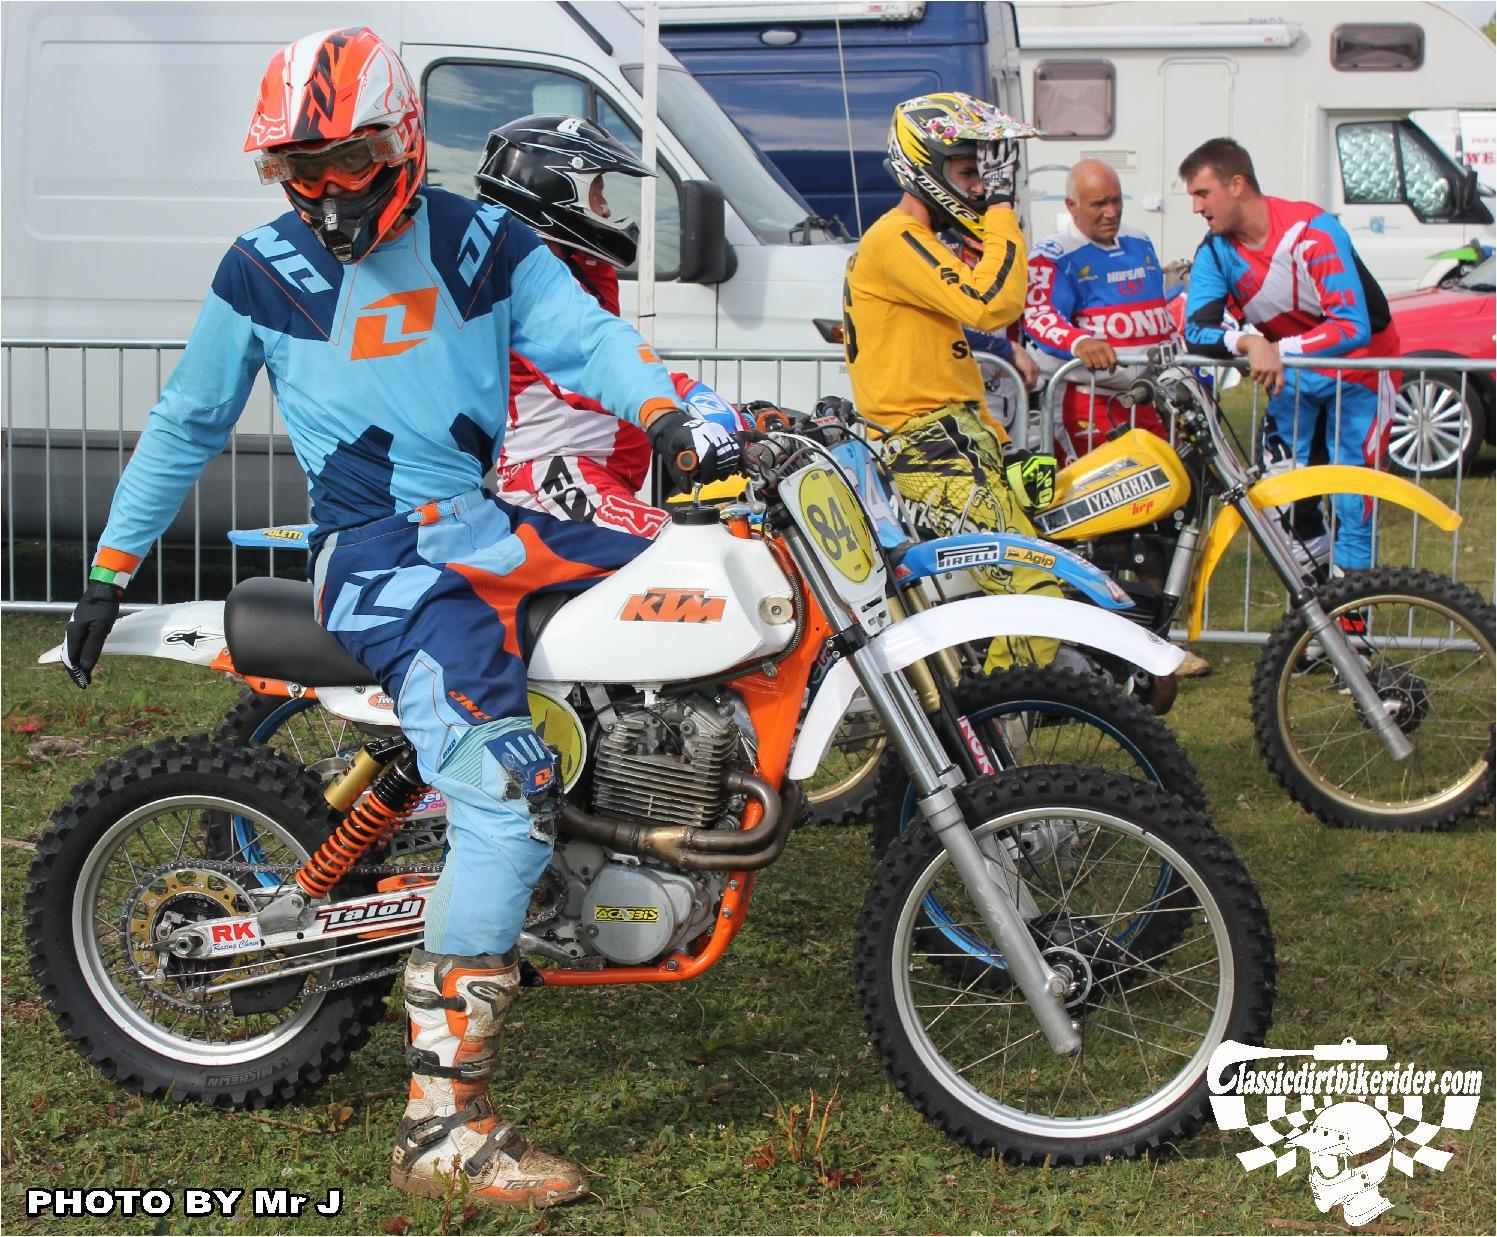 MX Vintage Bonanza 2015 Ford Moto Park July 19th classicdirtbikerider.com 13 KTM FOURSTROKE TWINSHOCK BIKE